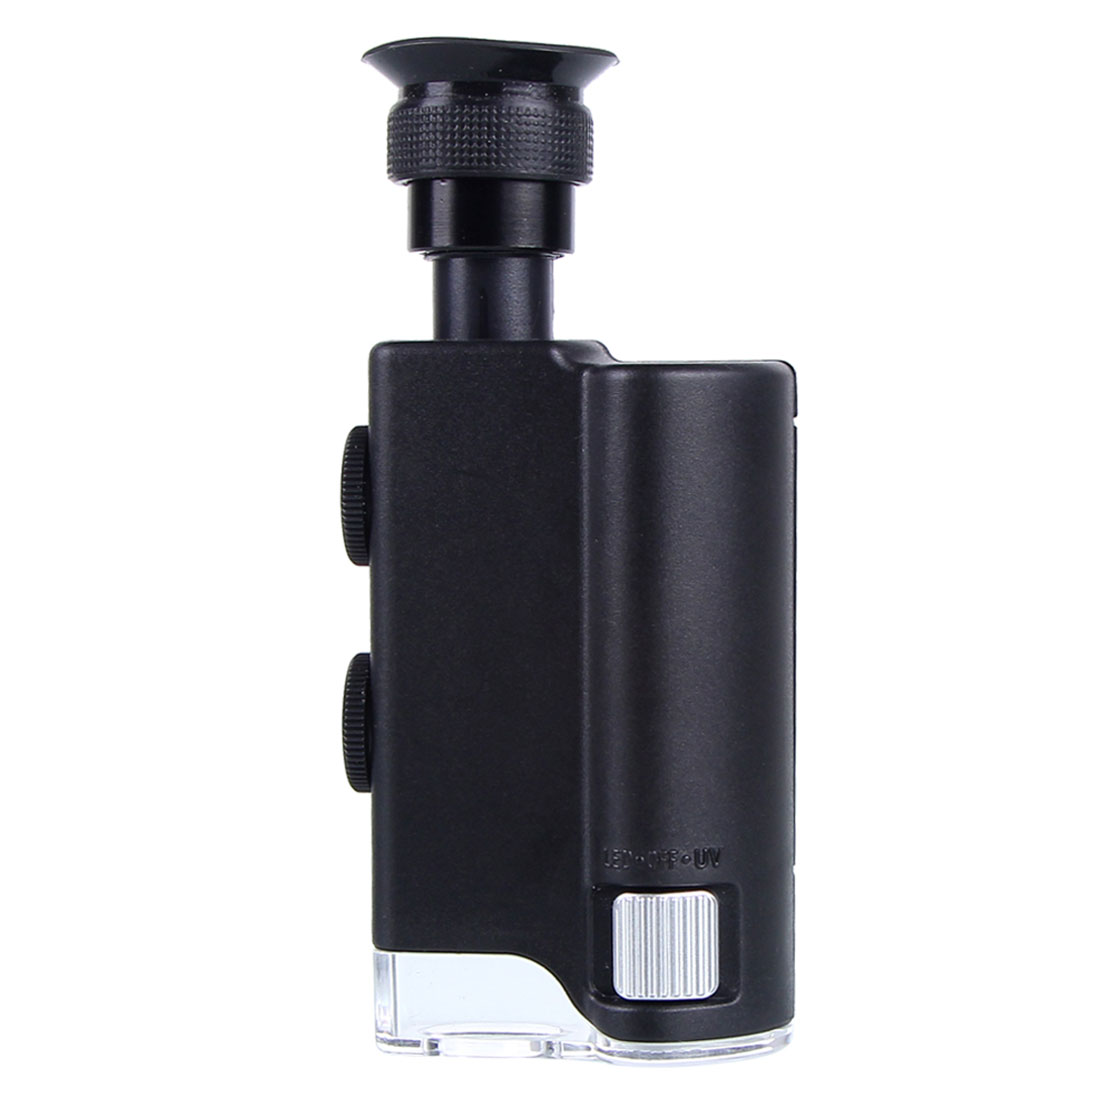 Hot Mini Portátil de Bolso Microscópio 200X ~ 240X Portátil CONDUZIU a Luz Da Lâmpada Lupa Zoom Lente Lupa Lupa Lupa de Bolso